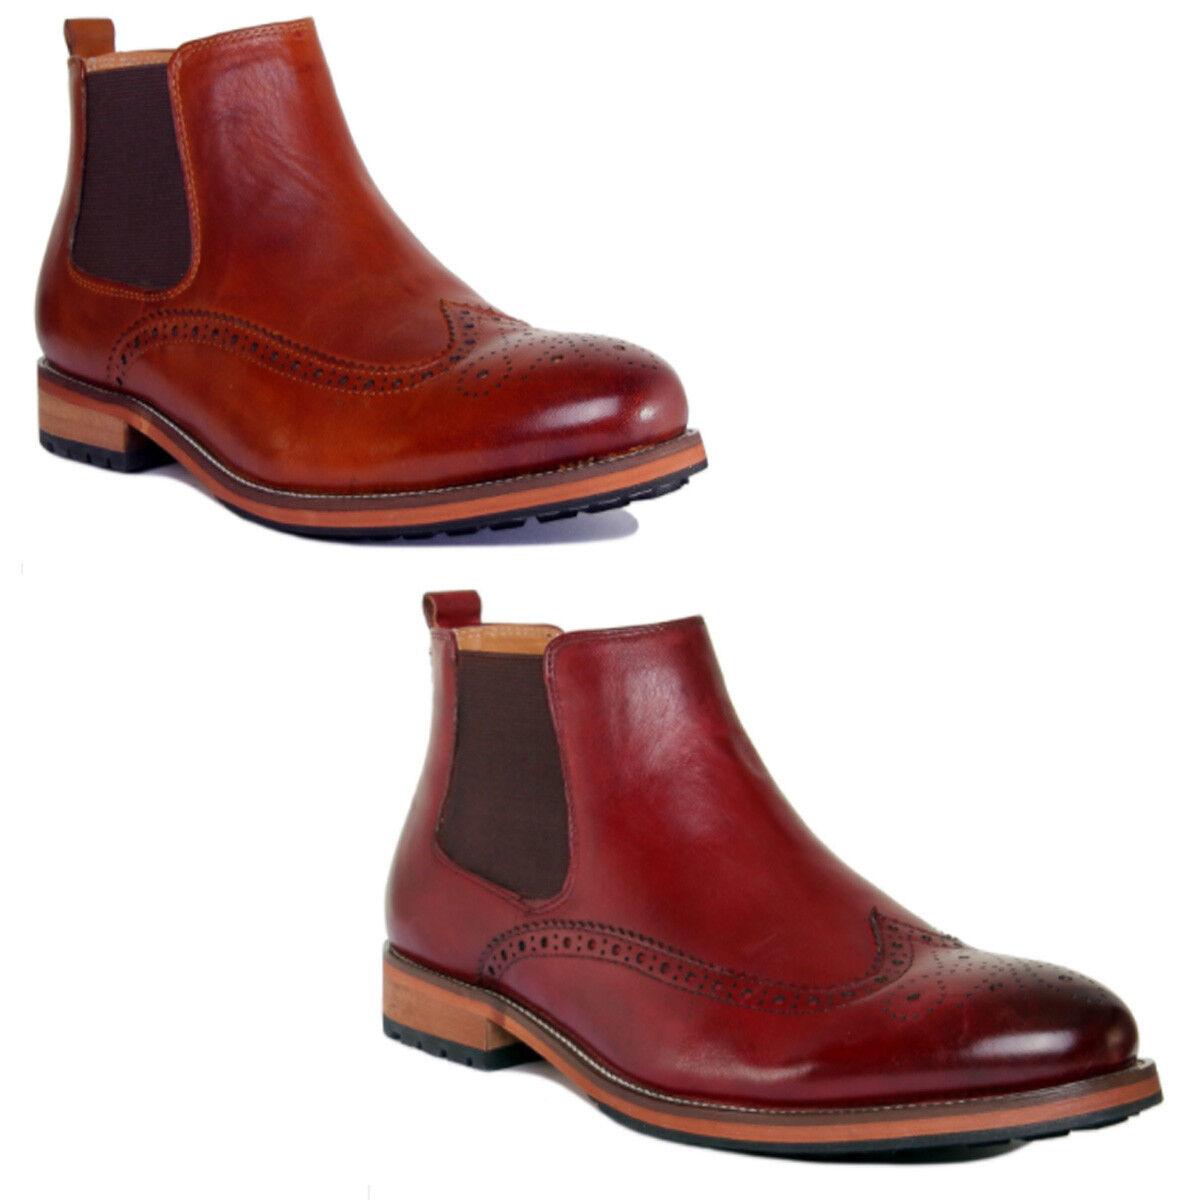 Justin Reece Barton Men Leather Matt Brown Ankle Boots Size UK 6 -12